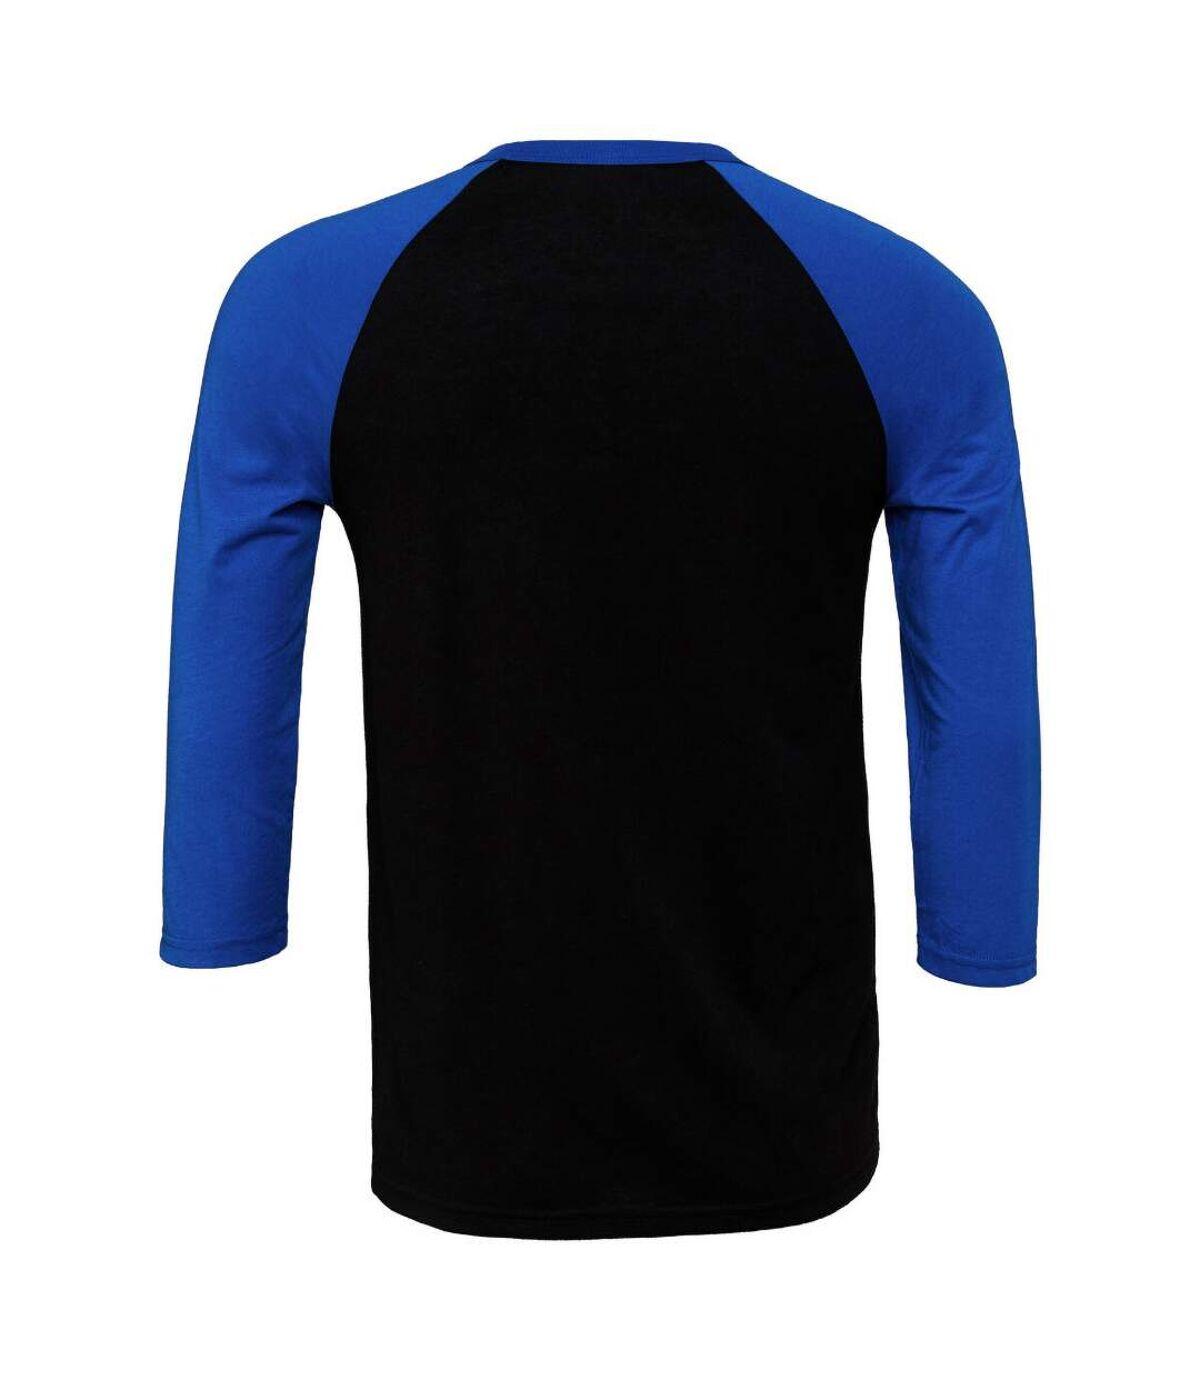 Canvas Mens 3/4 Sleeve Baseball T-Shirt (Black/True Royal) - UTBC1332